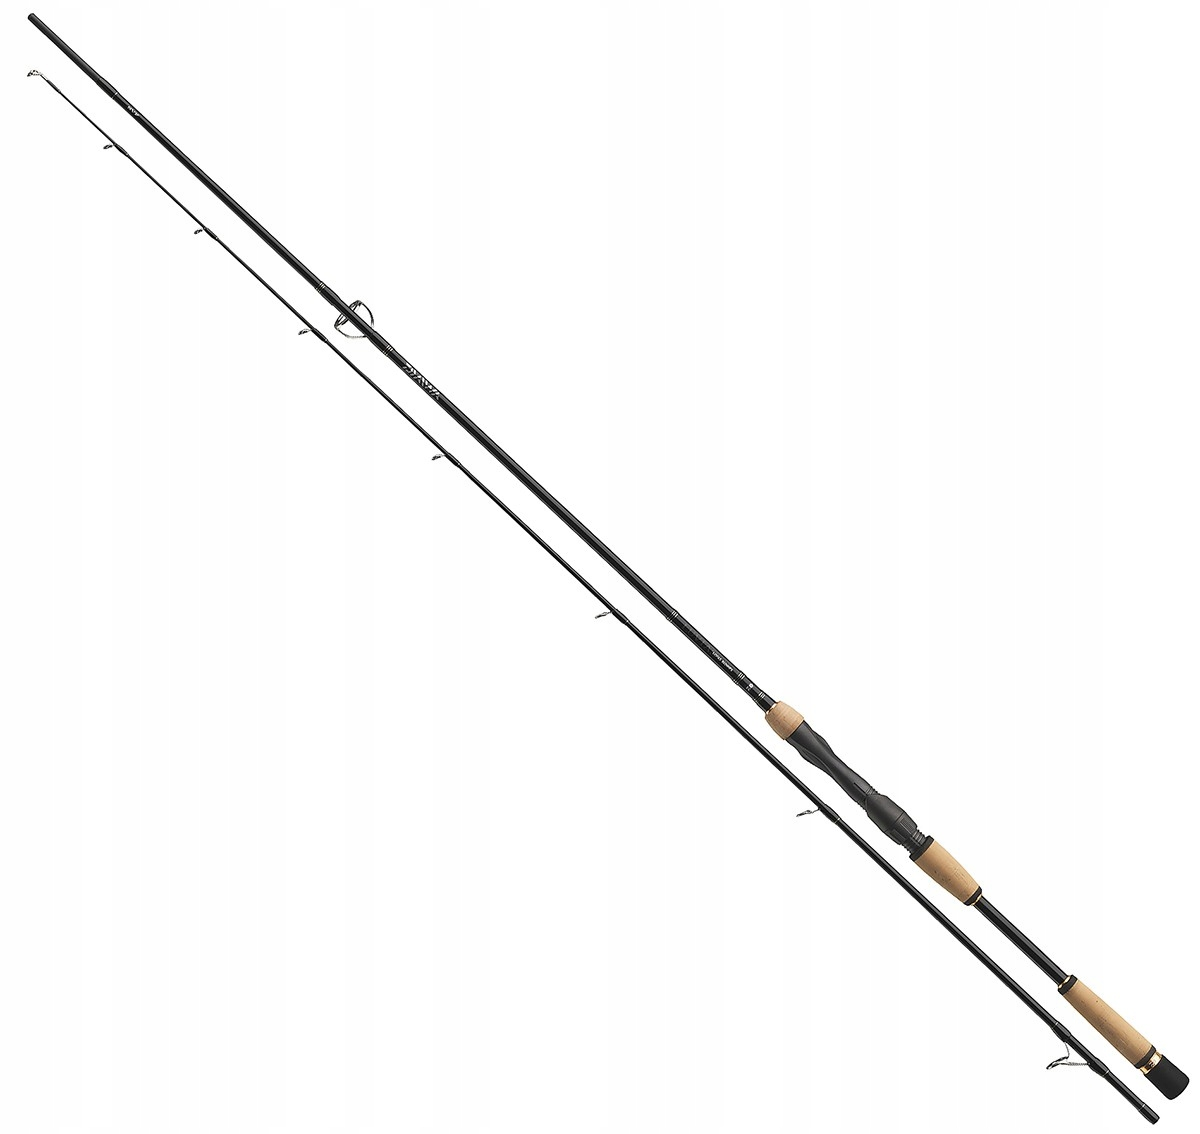 Tyč na Daiwa Luvias 902 MHFS-AD 3.04 m 10-40g